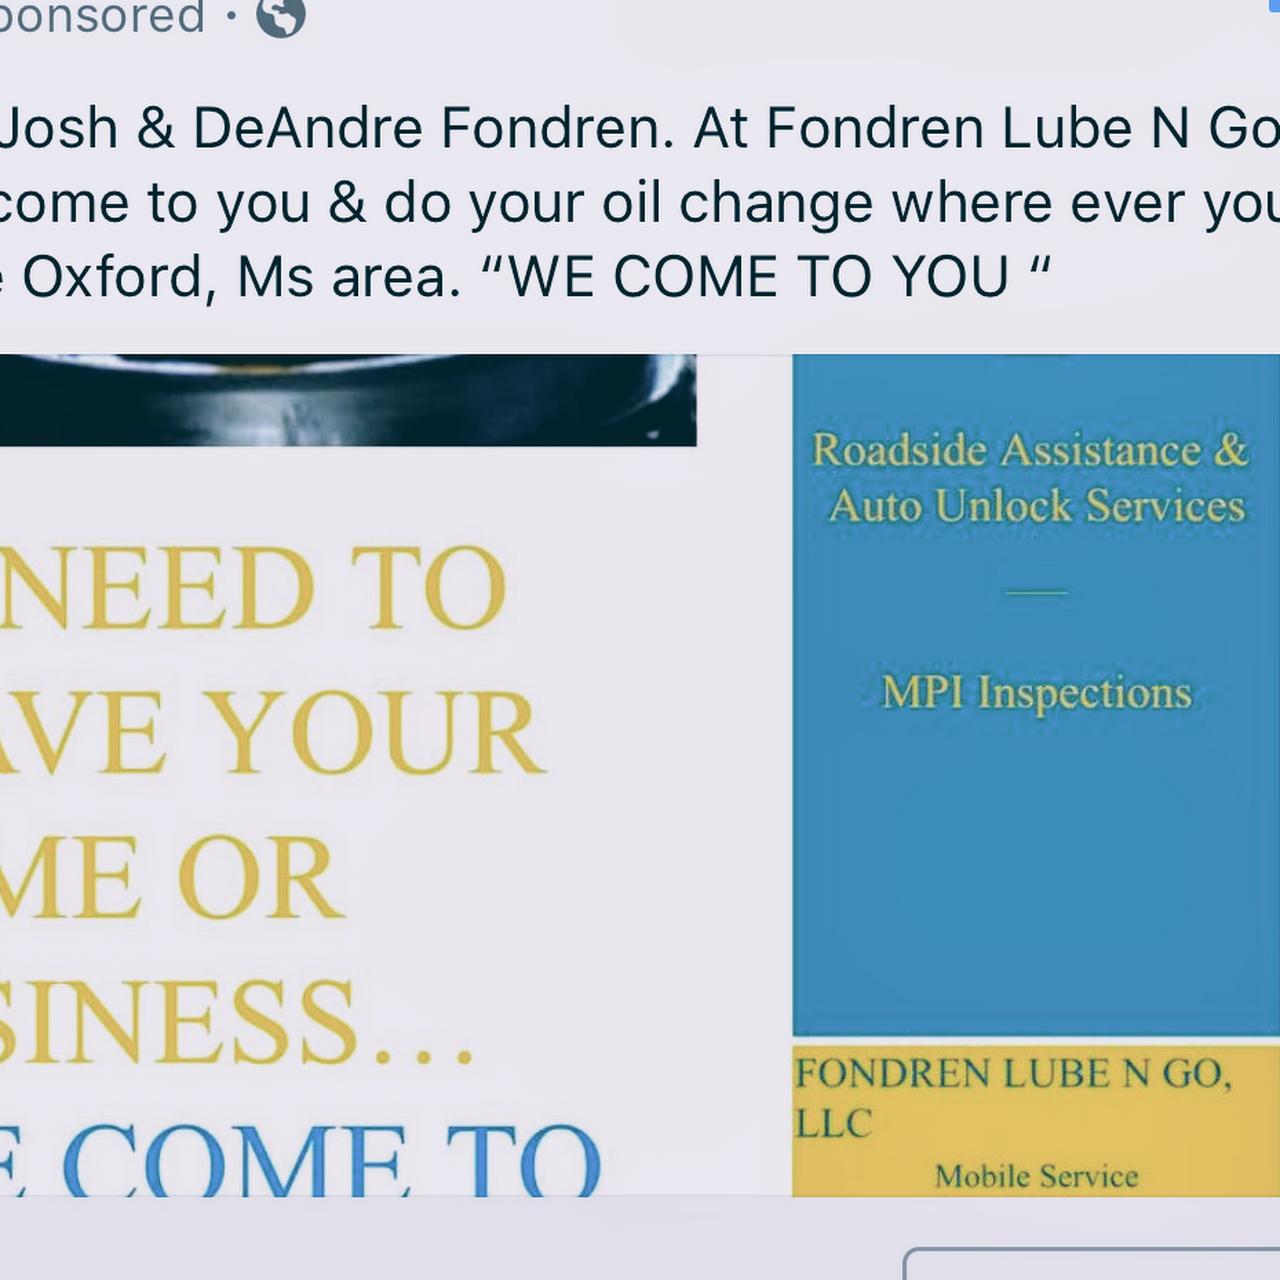 Lube N Go >> Fondren Lube N Go Llc Oil Change Service In Oxford